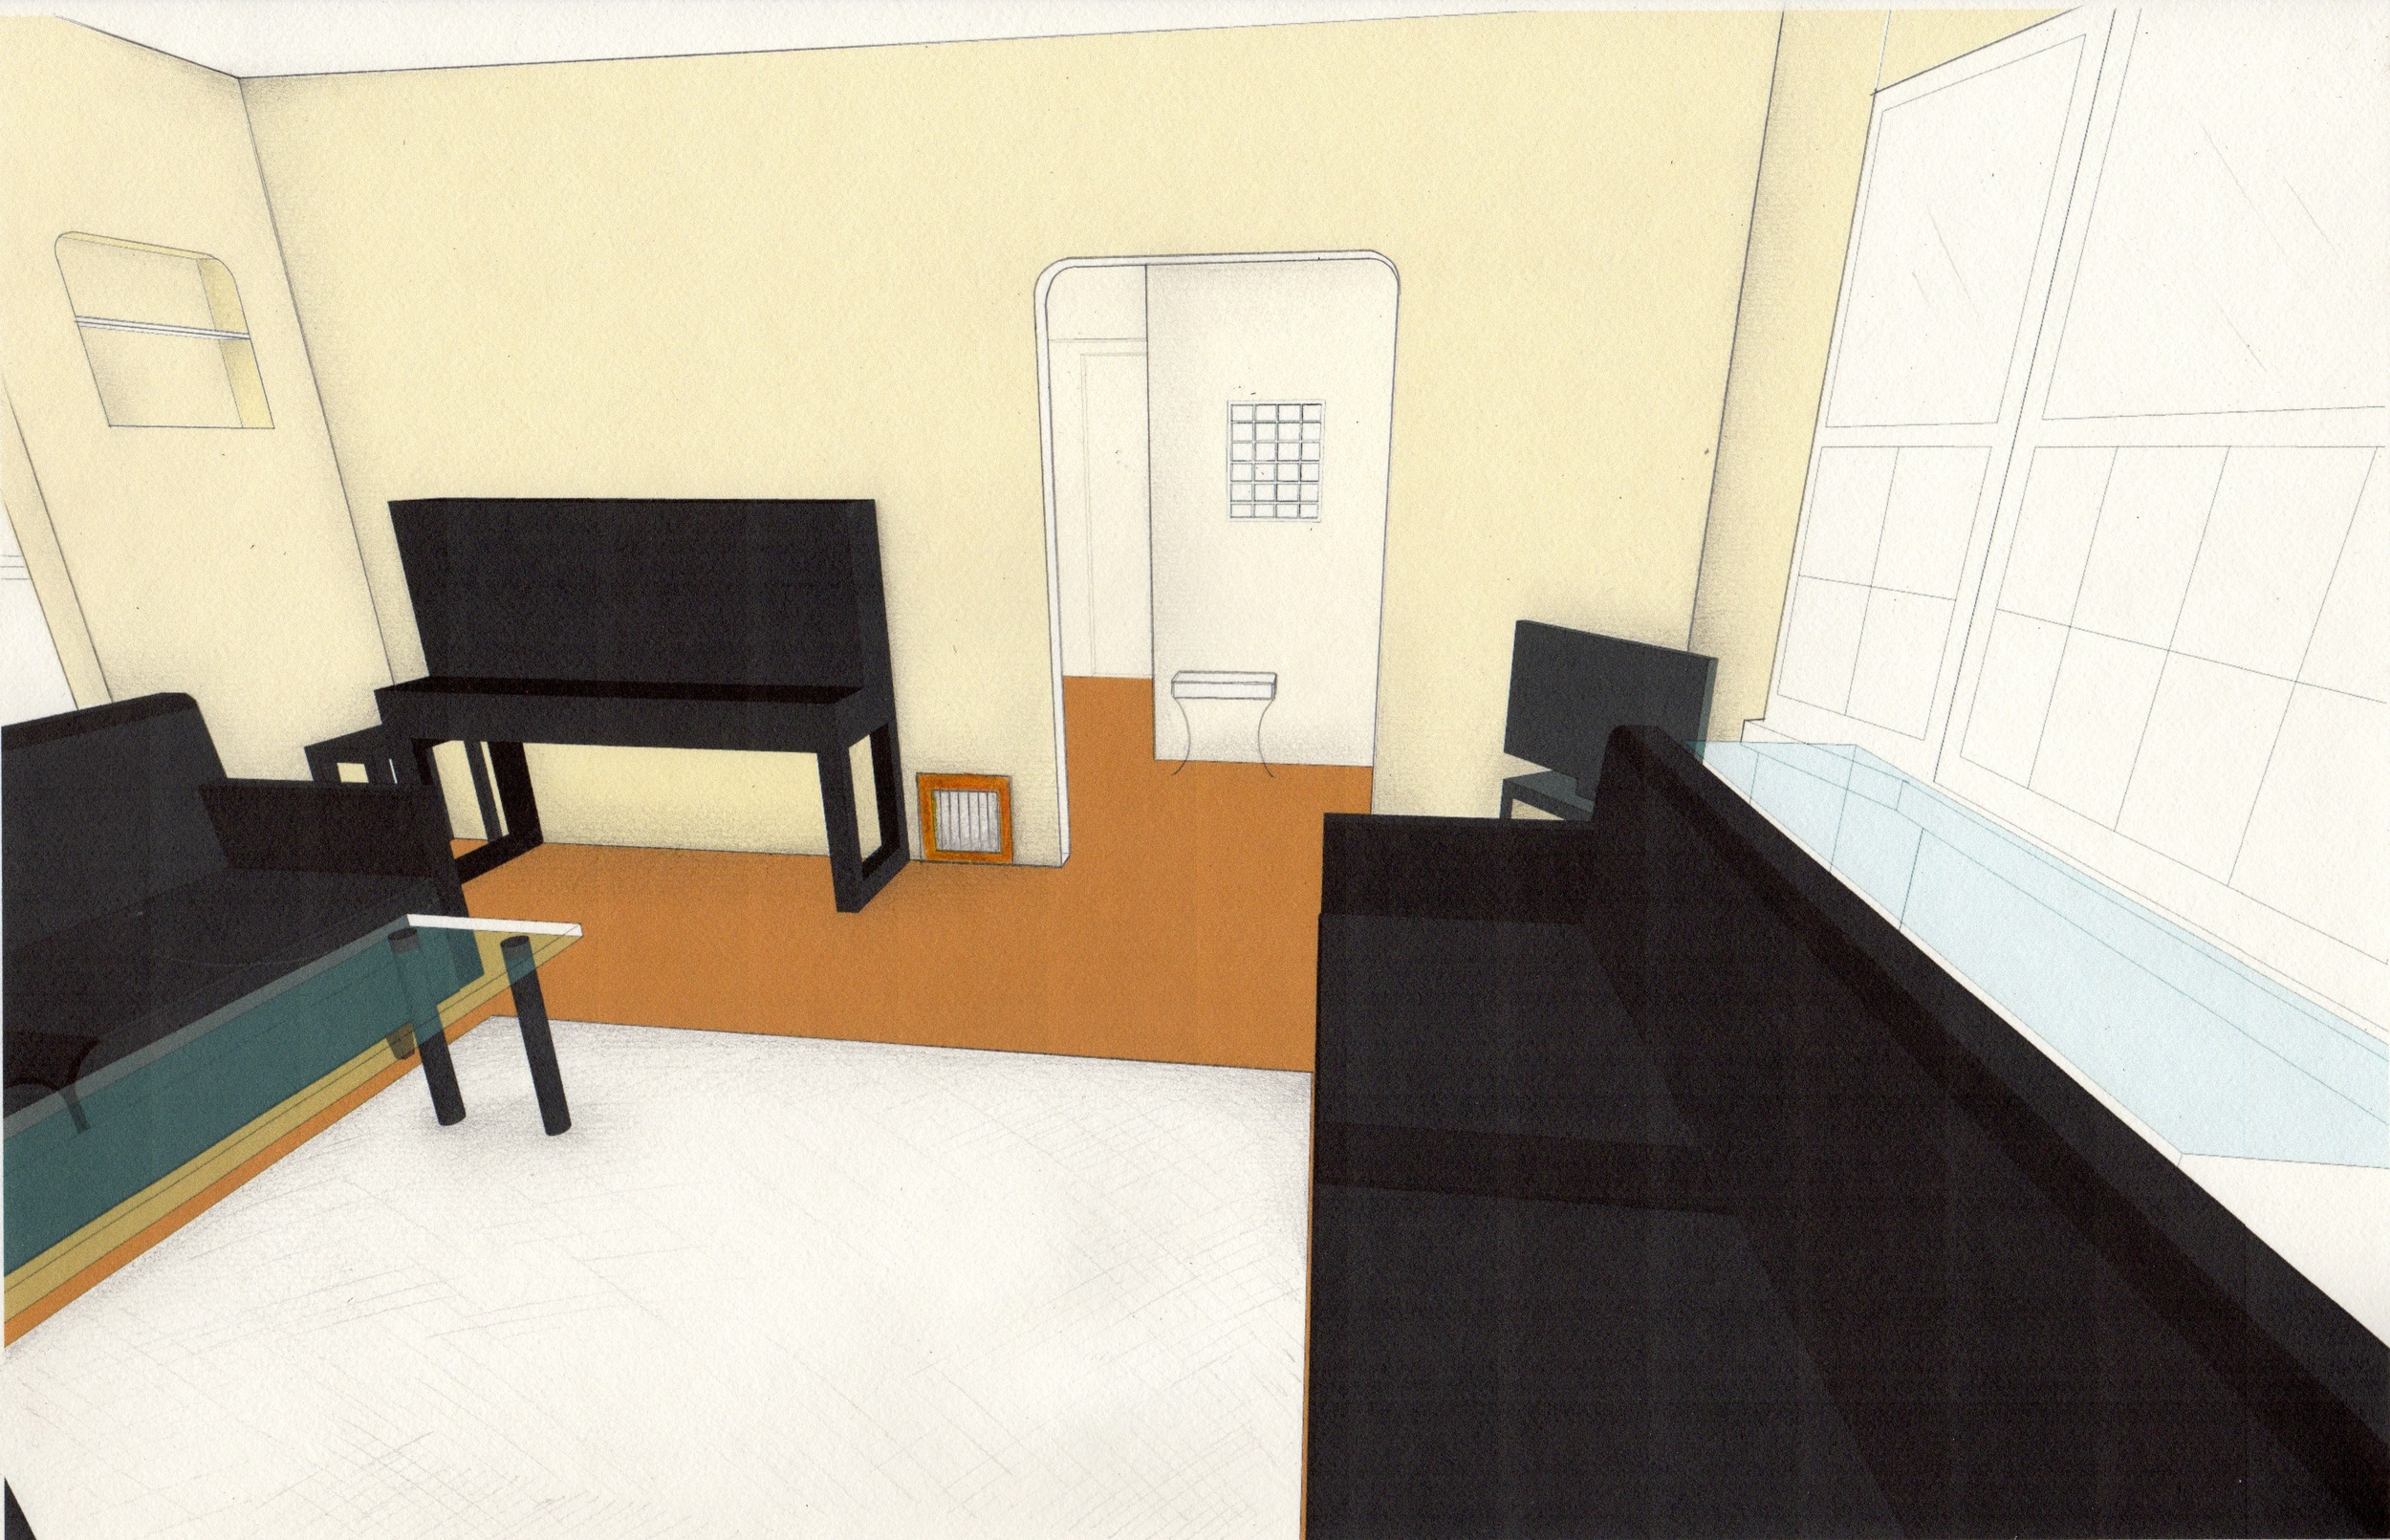 Proposed living room design